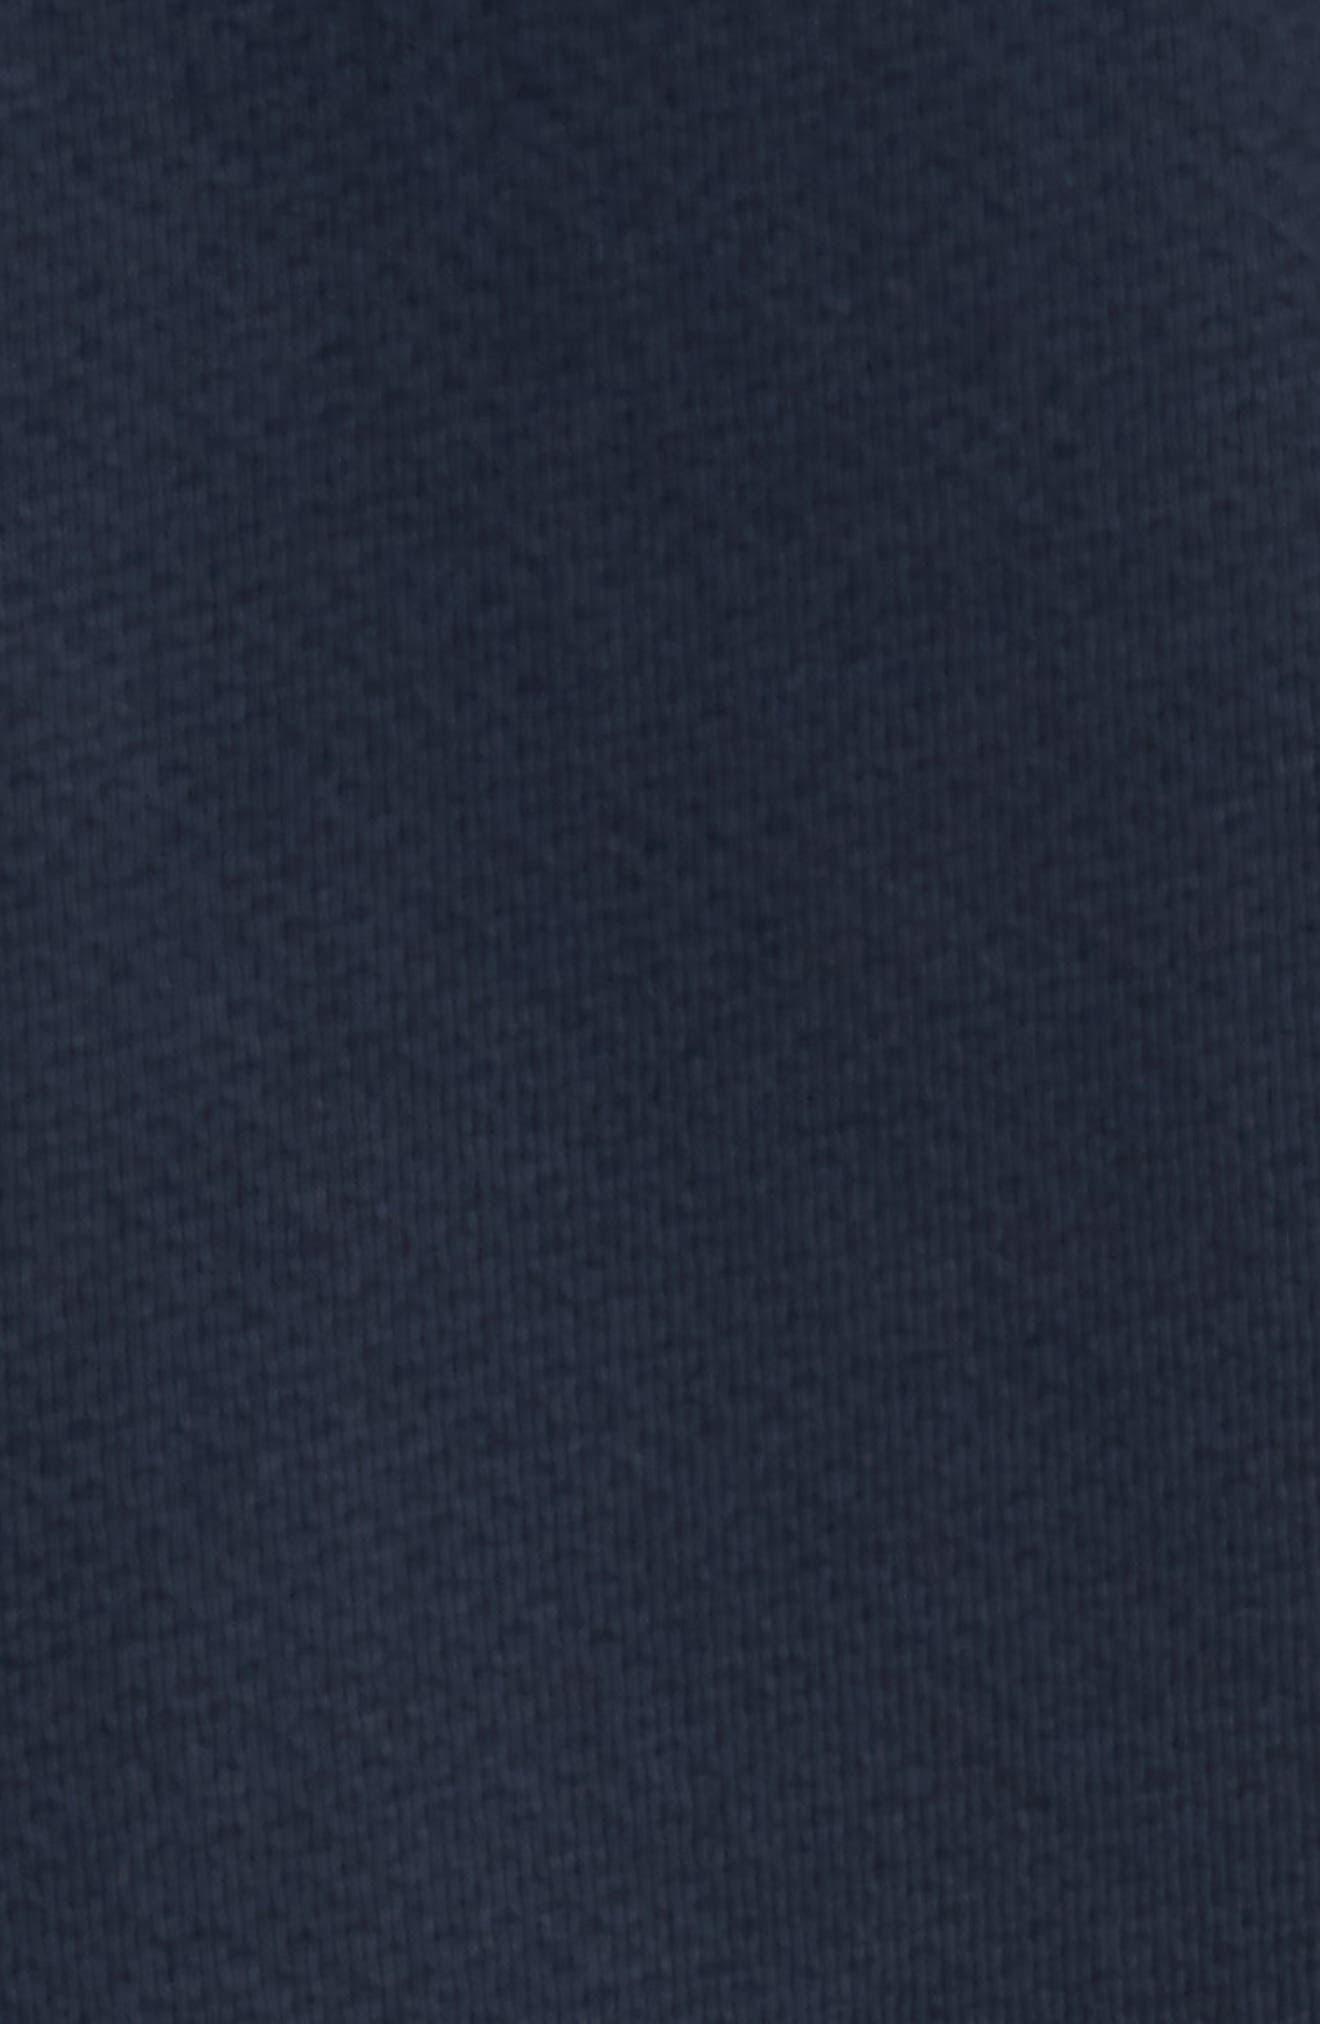 Rhodes Motorcross Knit Jacket,                             Alternate thumbnail 5, color,                             Ink